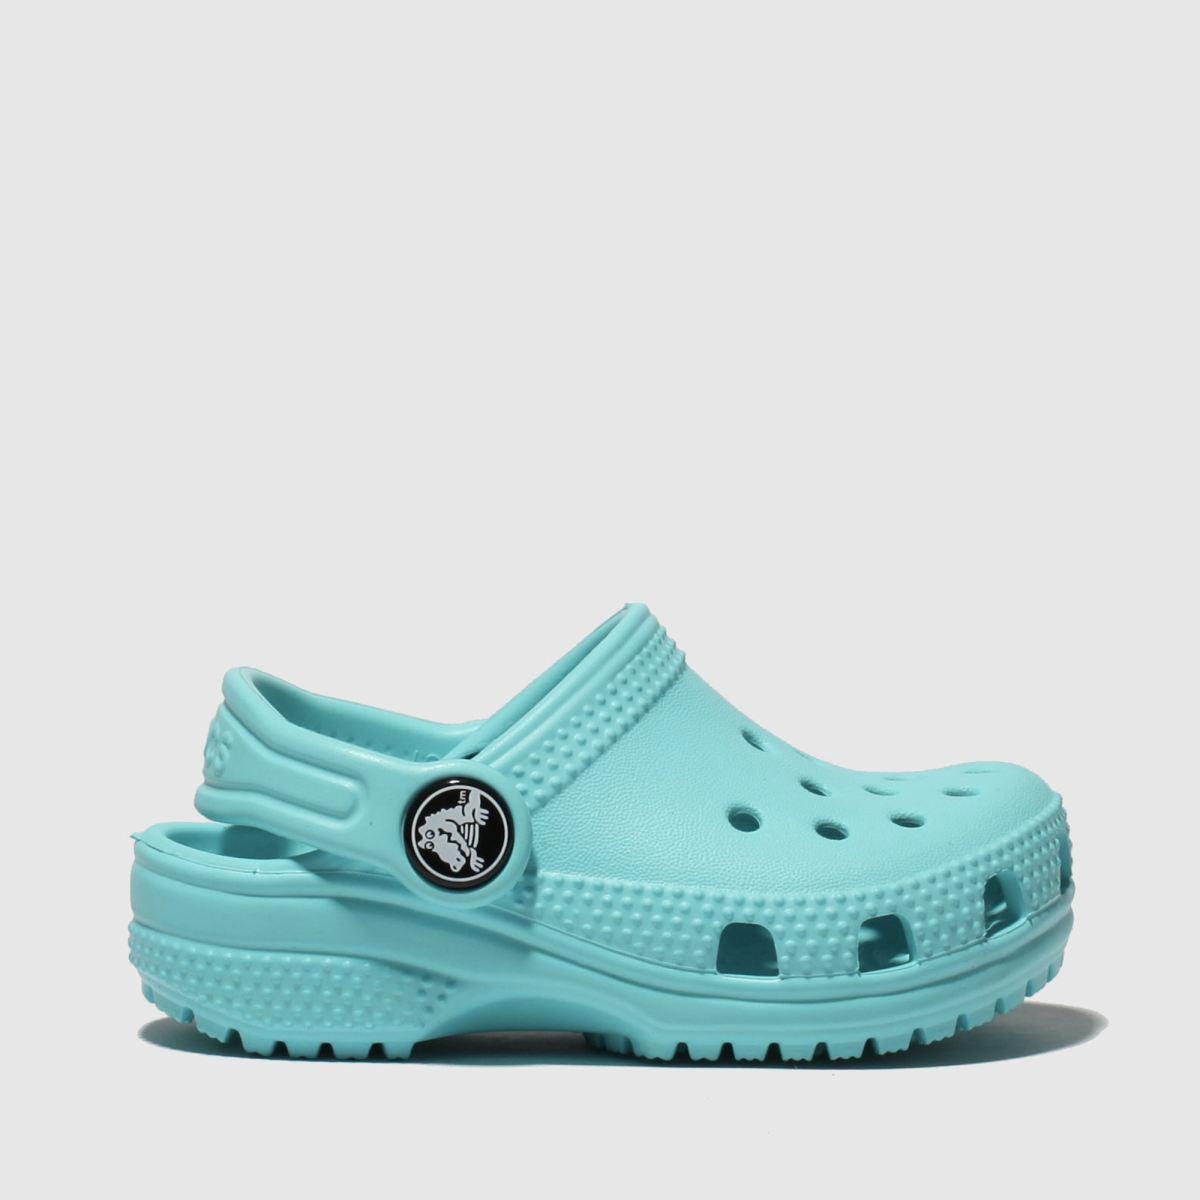 Crocs Turquoise Classic Clog Sandals Toddler